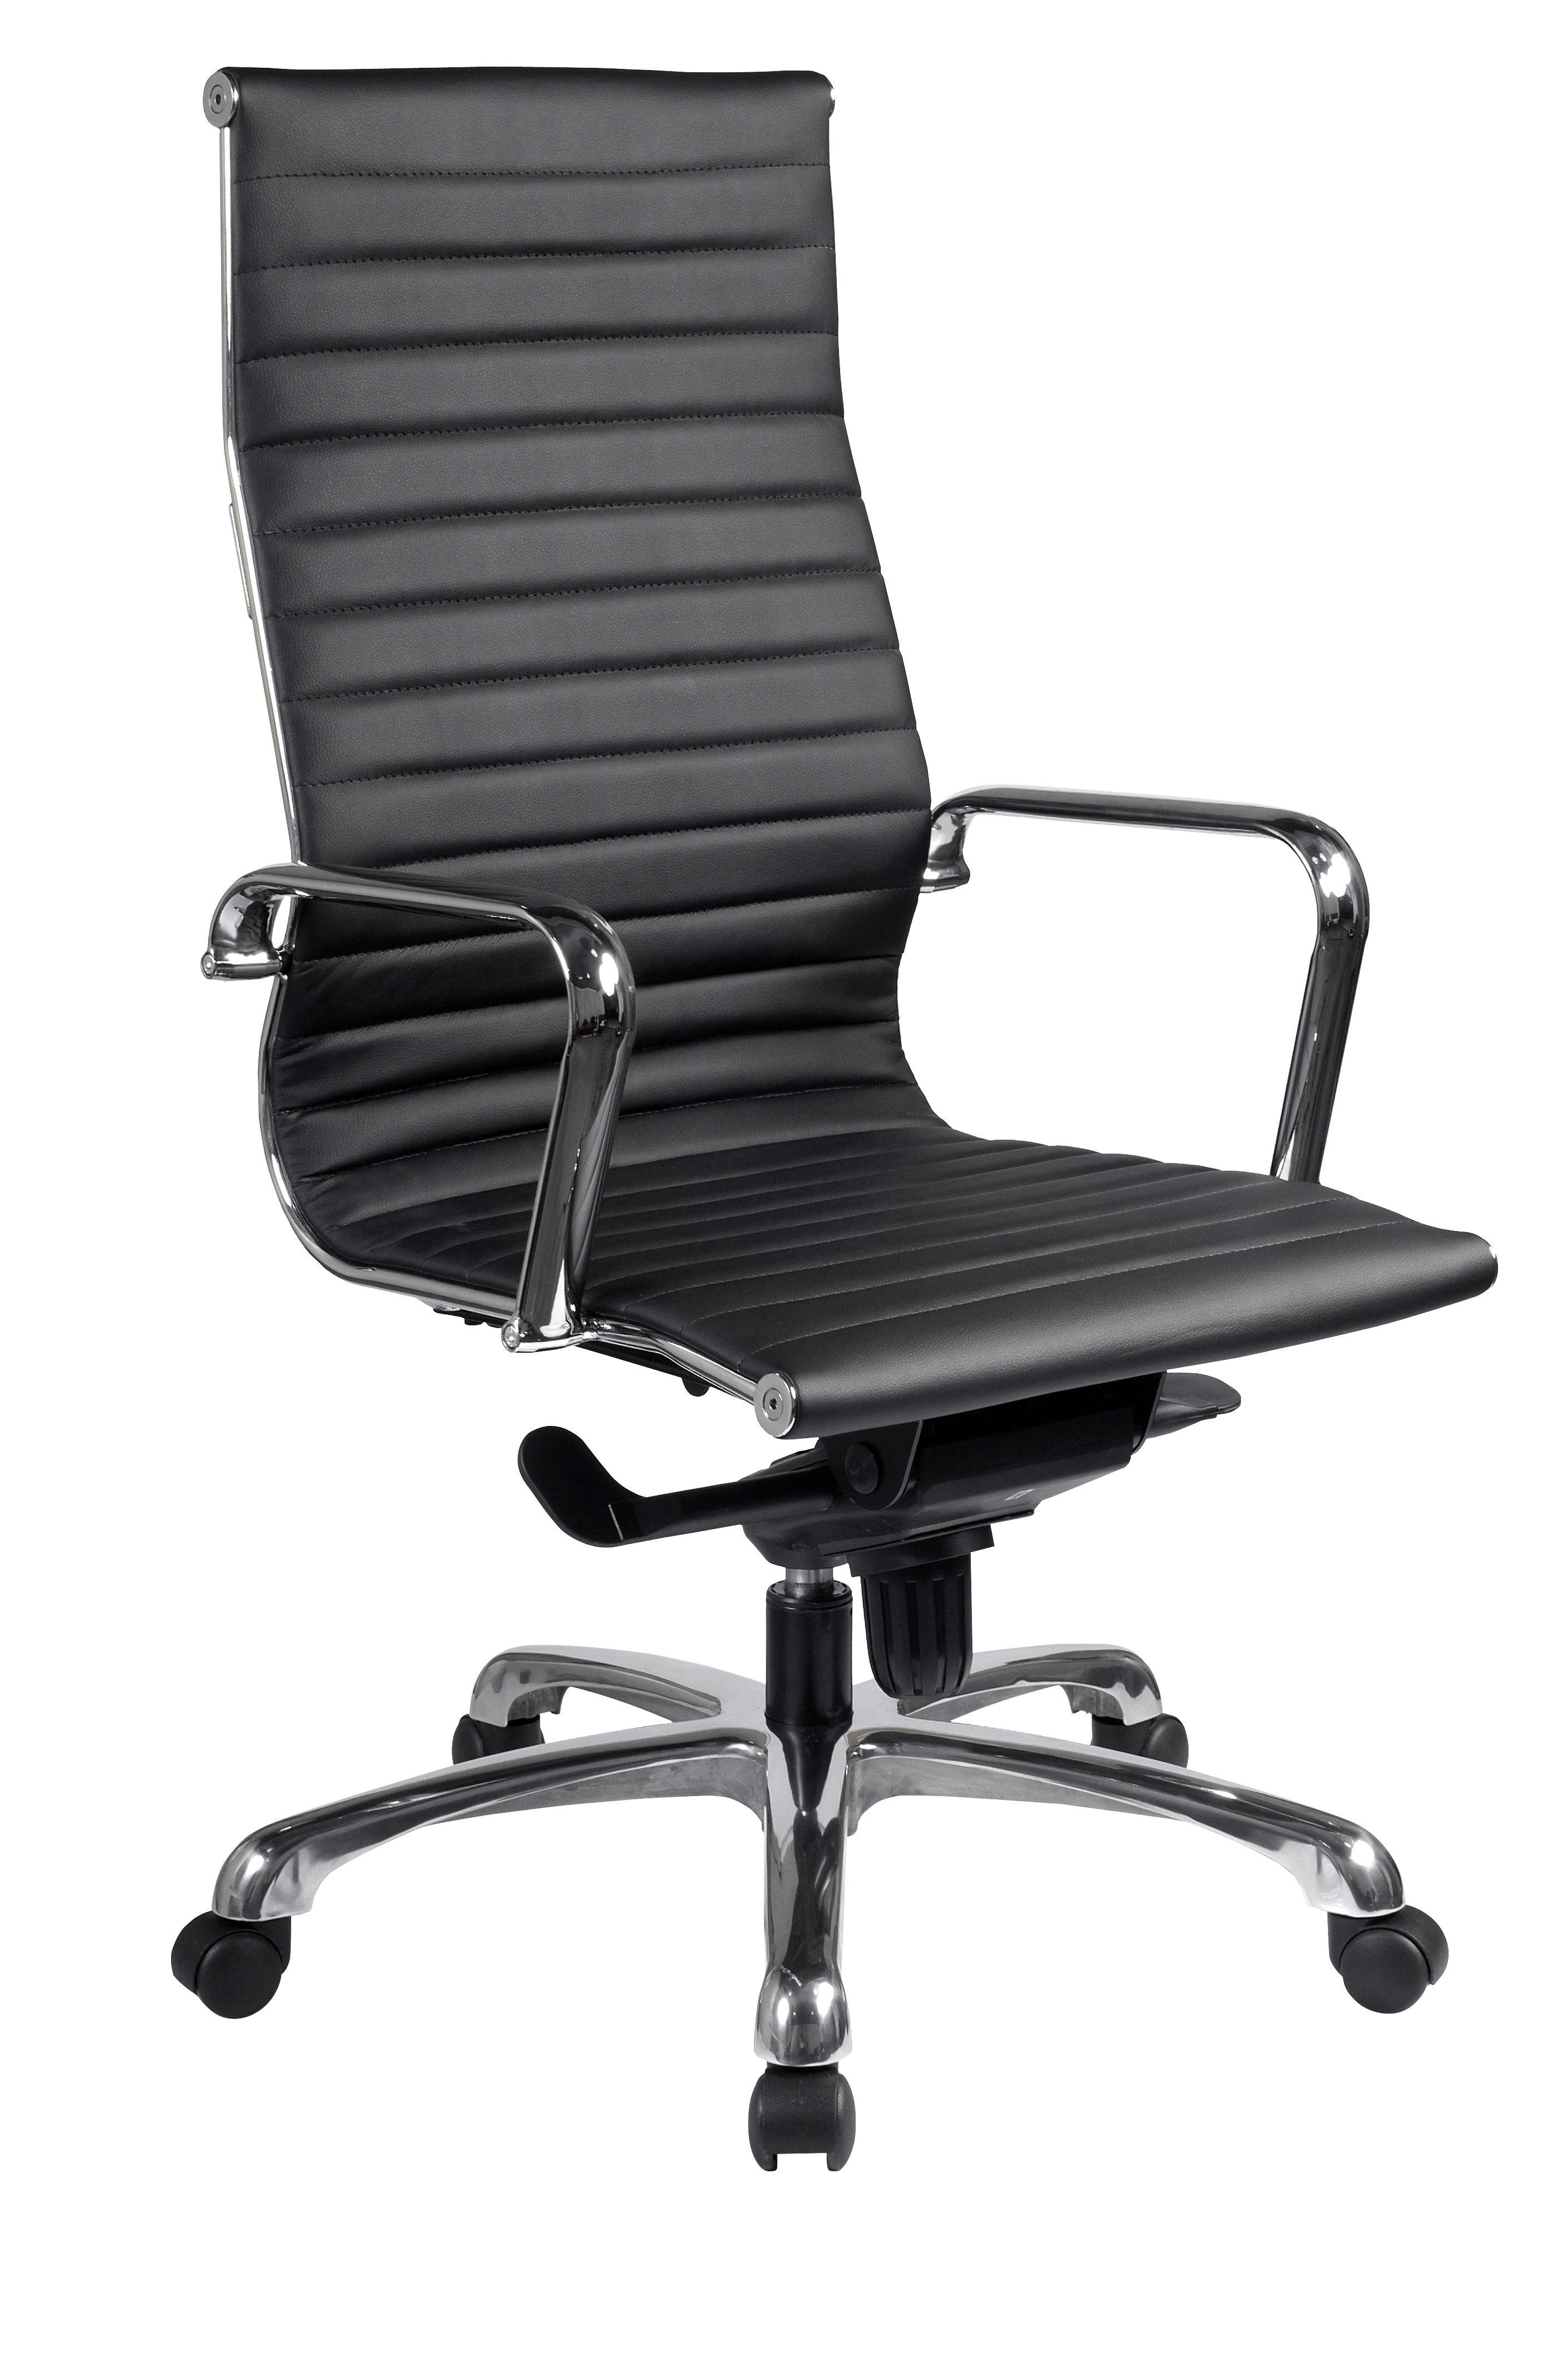 Nova High Back By Premiere Office Furniture Manufacturer